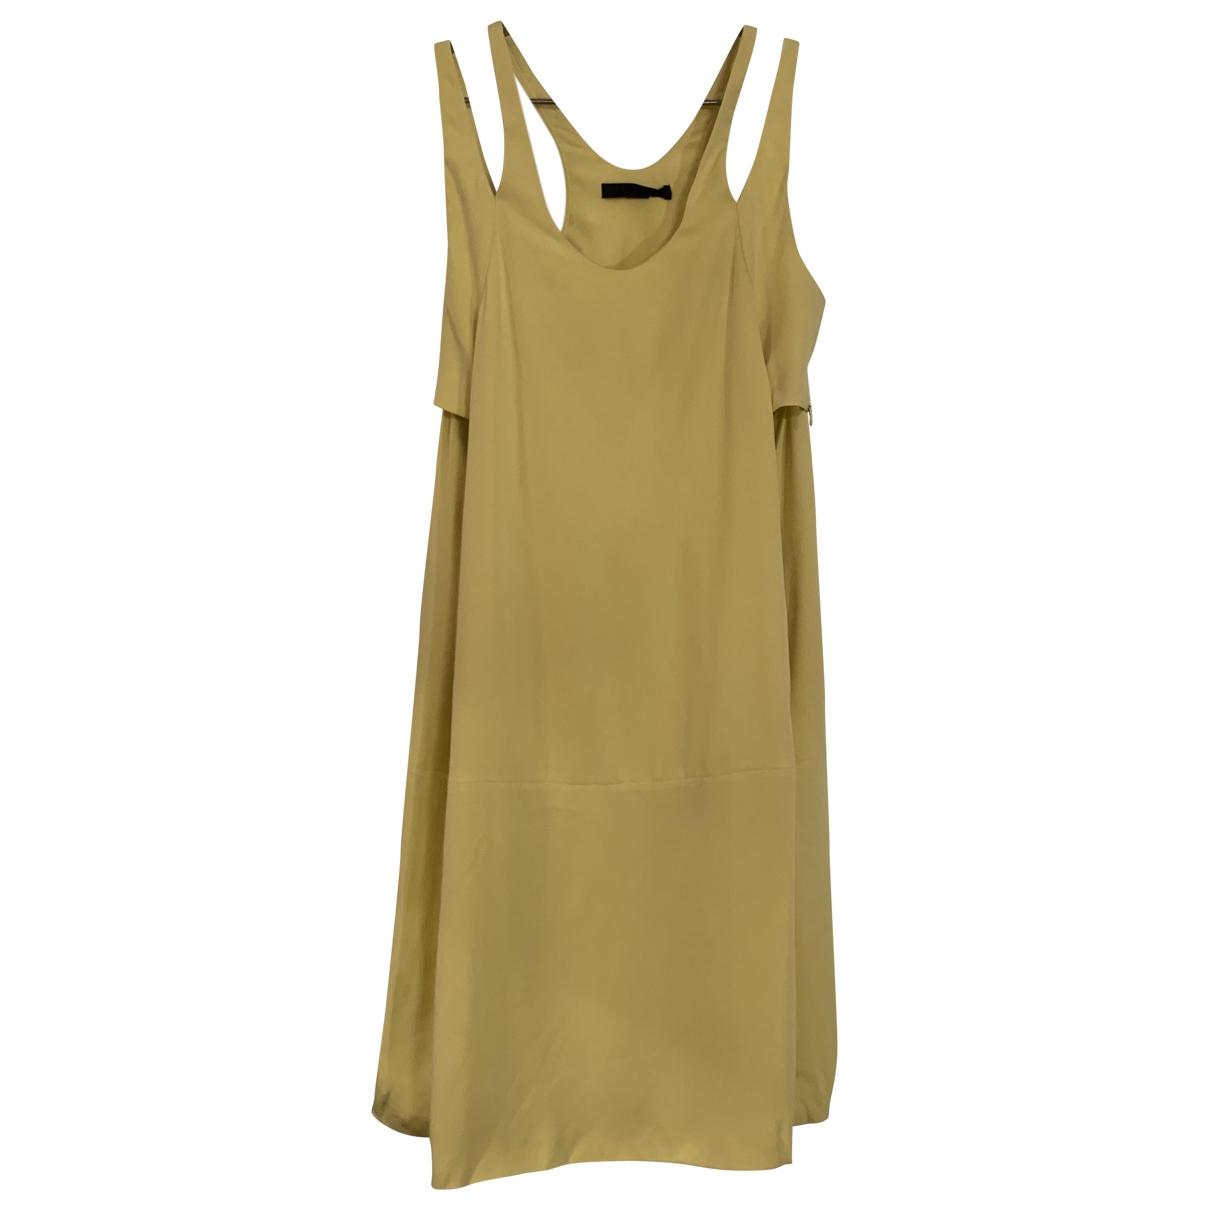 Alexander Wang \N Yellow dress for Women 4 US